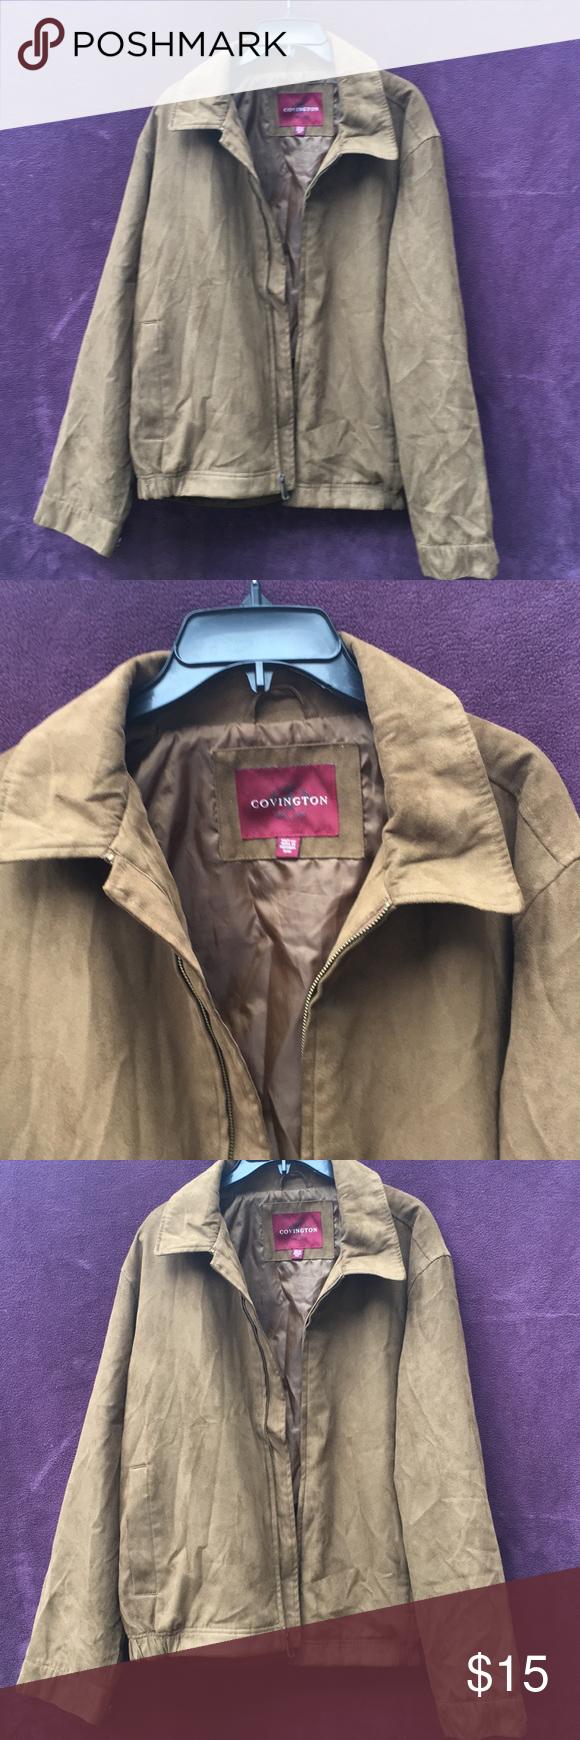 Brown Jacket Like A Brand New Medium Size Covington Jacket Light Brown Worn Couple Times Covington Jackets Co Brown Jacket Jackets Lightweight Shirts [ 1740 x 580 Pixel ]